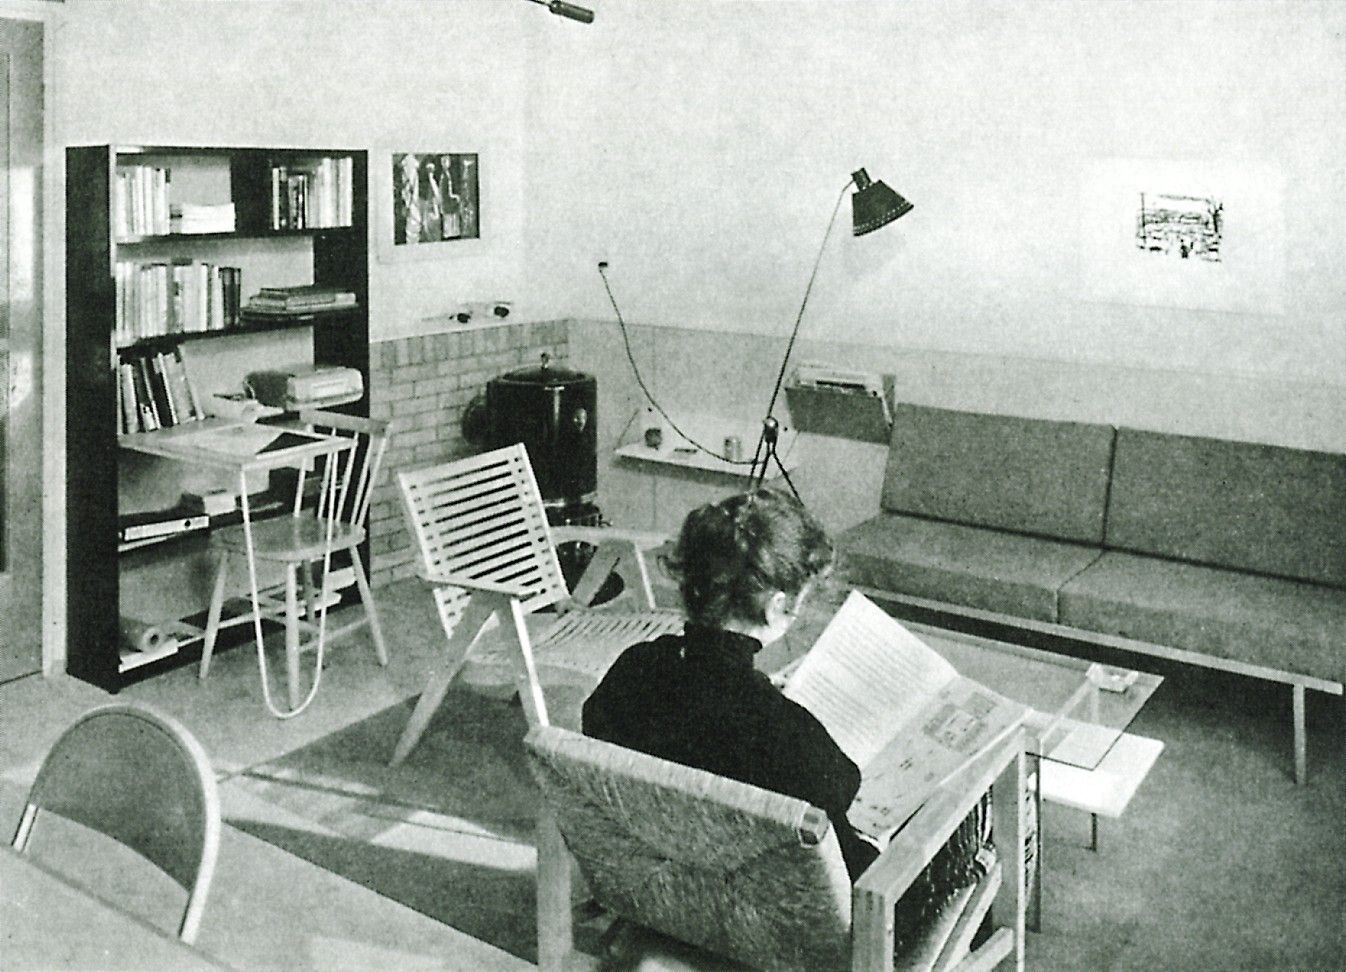 Niegeman johan goed wonen interieur woning kloos for Interieur 70 jaren